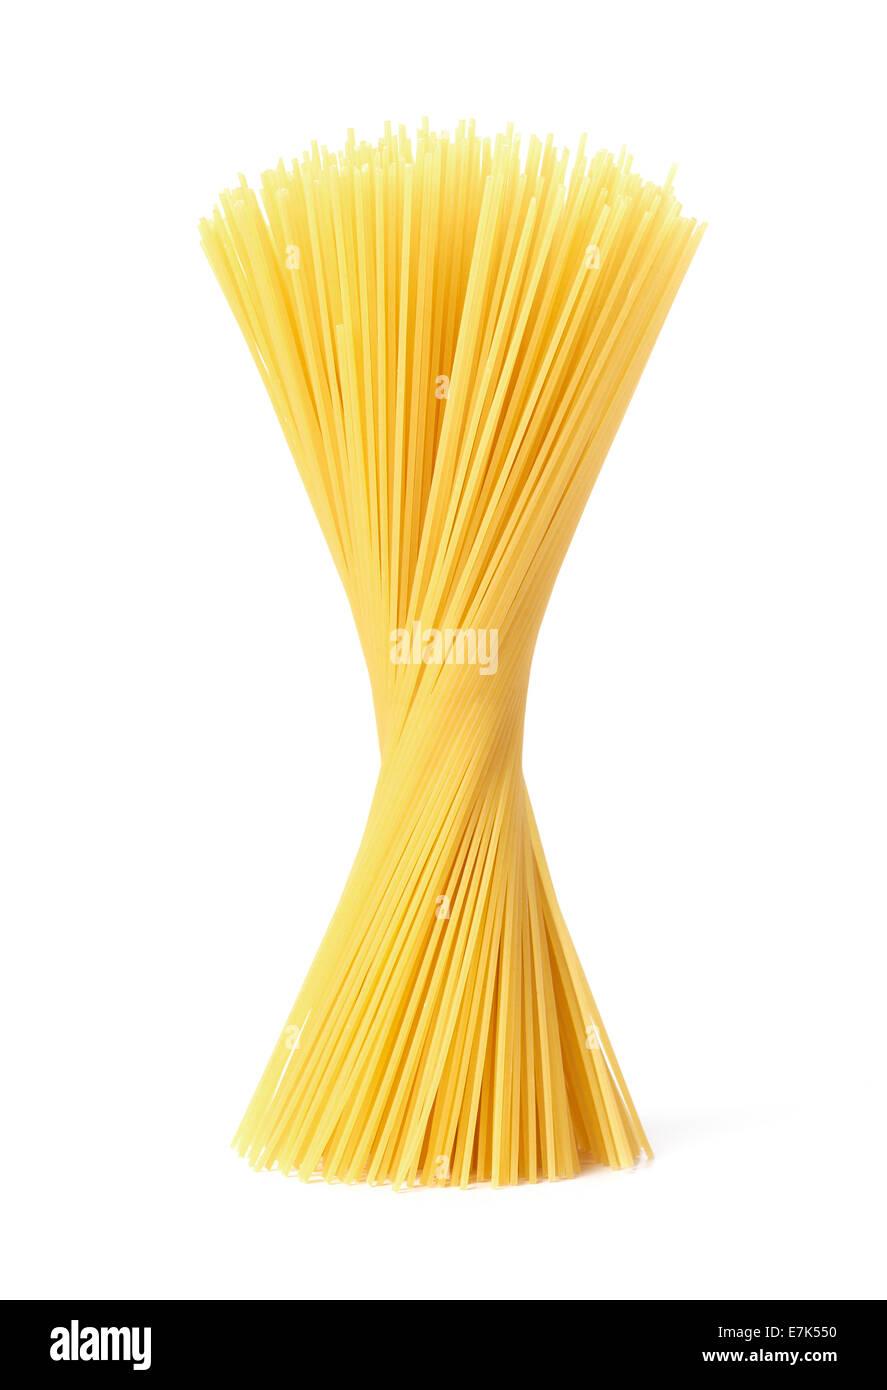 Pasta Spaghetti aislado Imagen De Stock